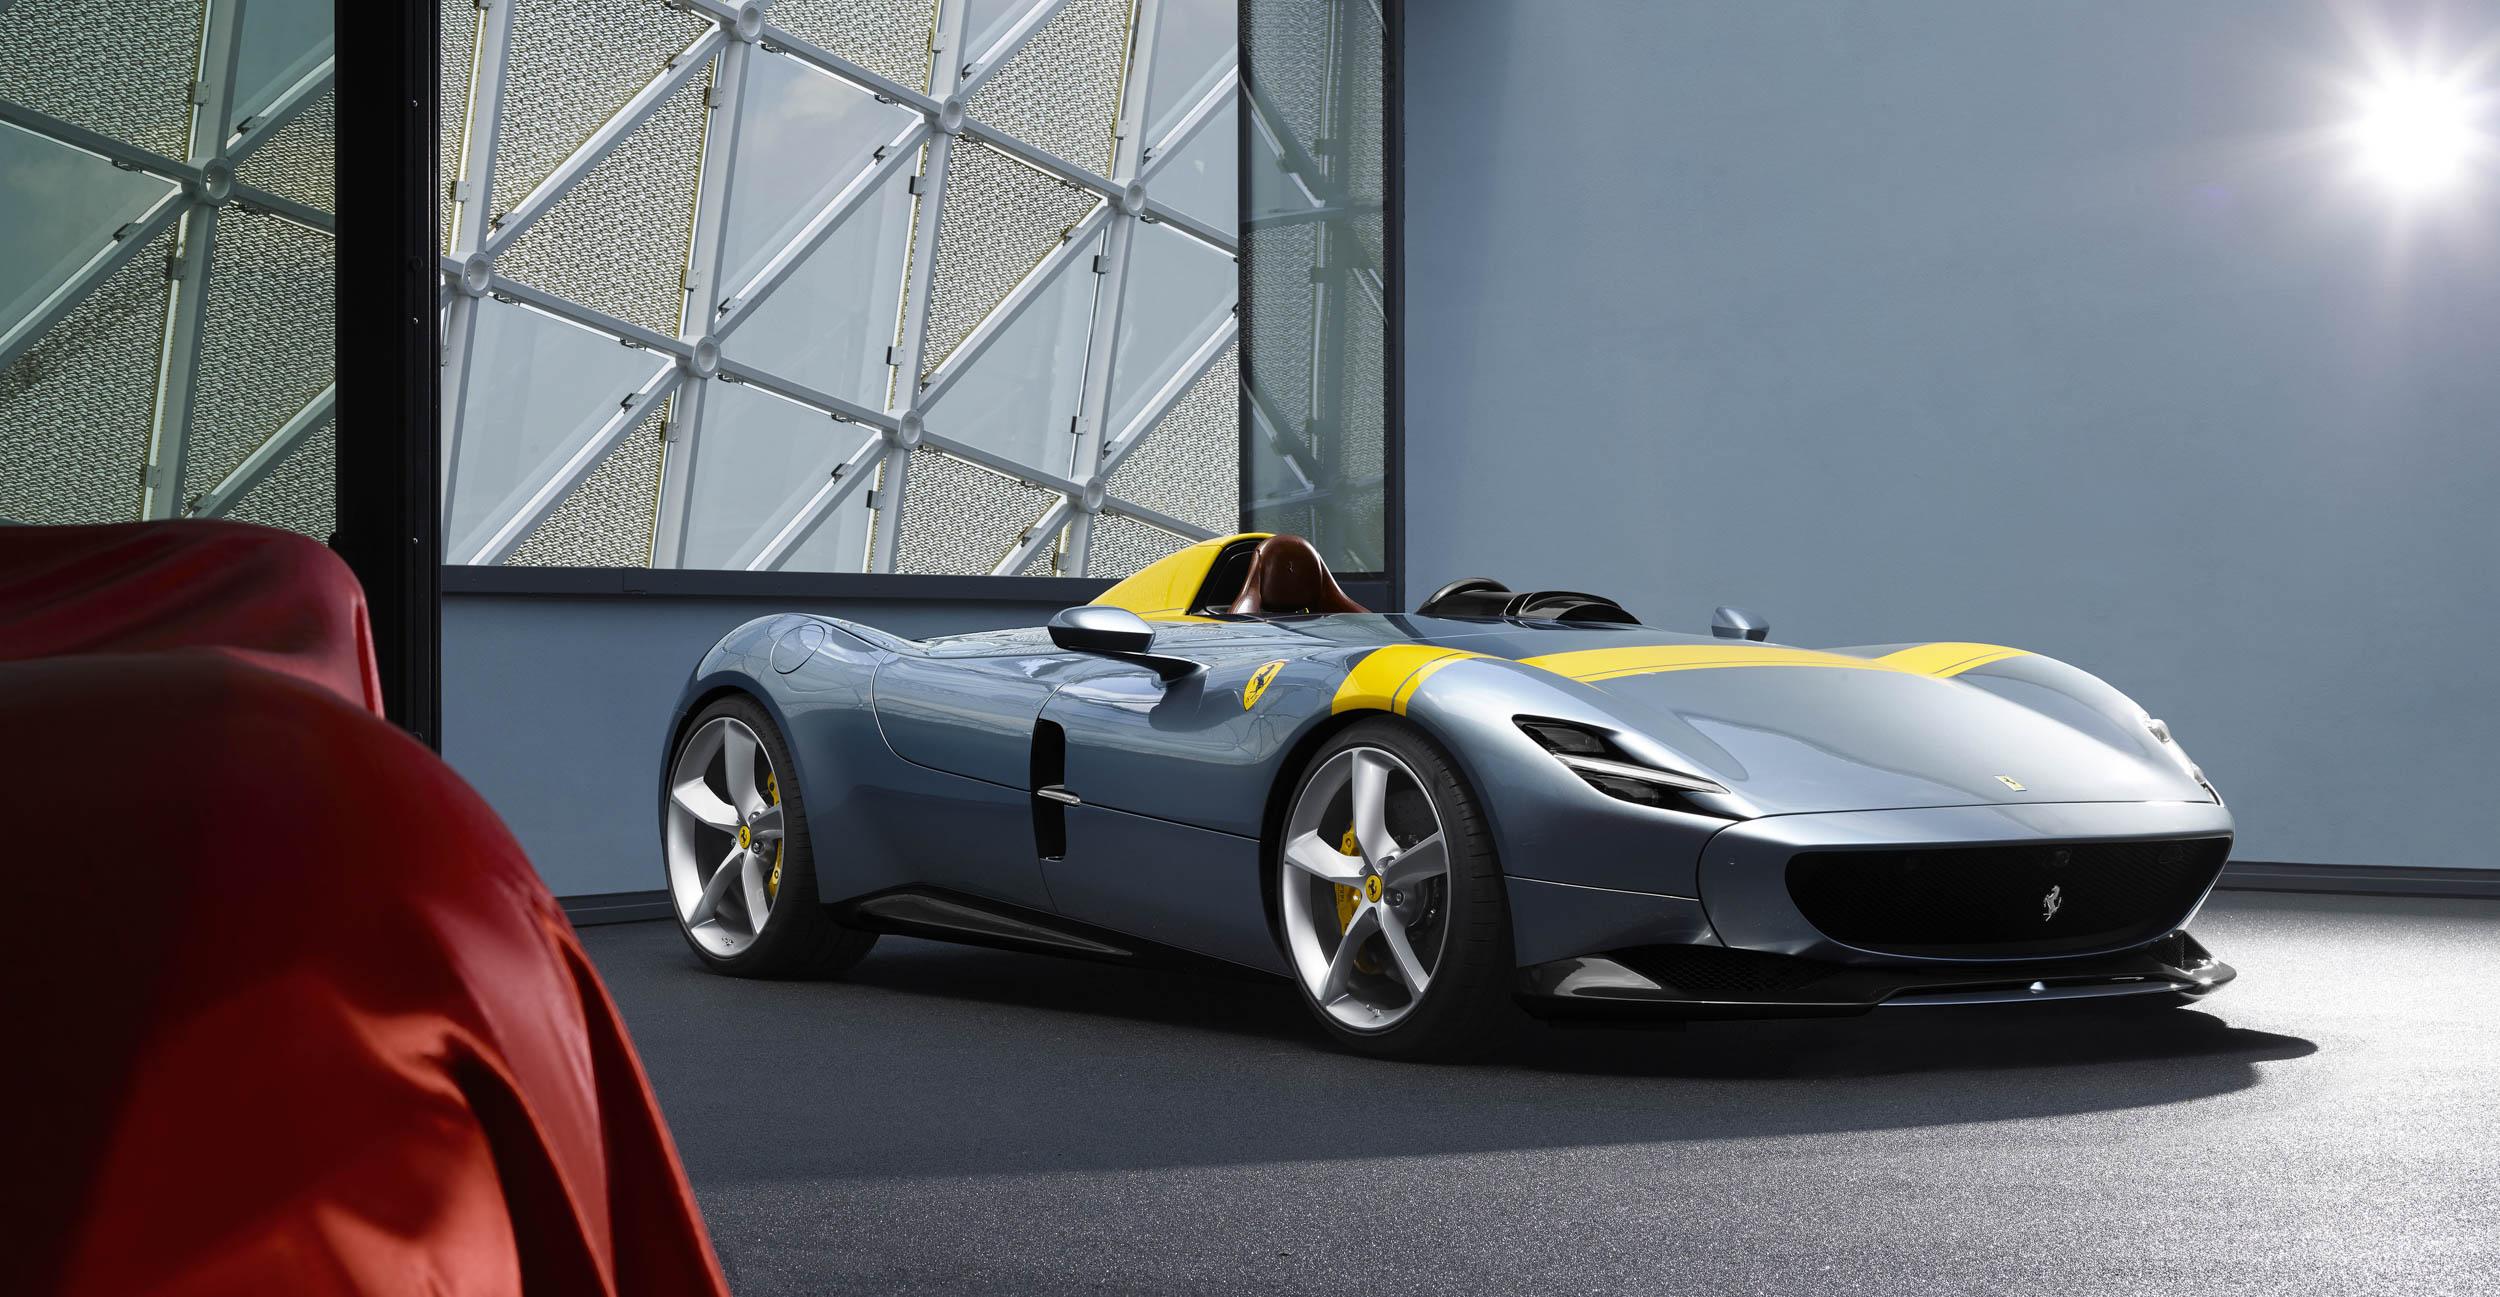 Ferrari Monza SP1 front 3/4